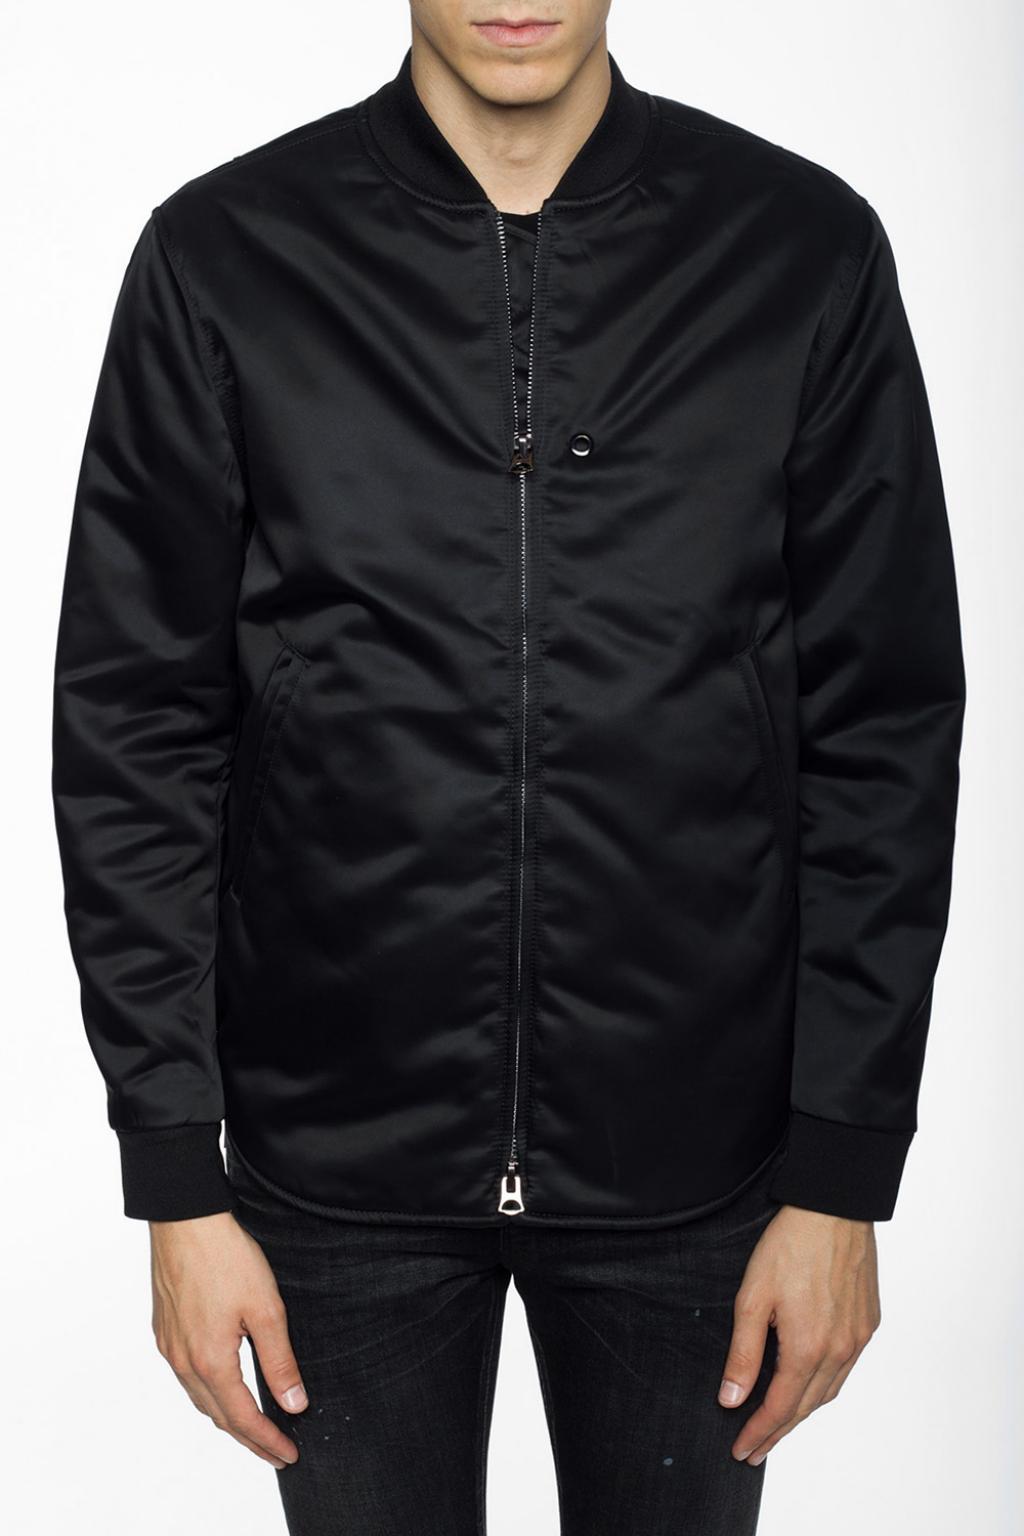 Acne Studios Synthetic Bomber Jacket for Men